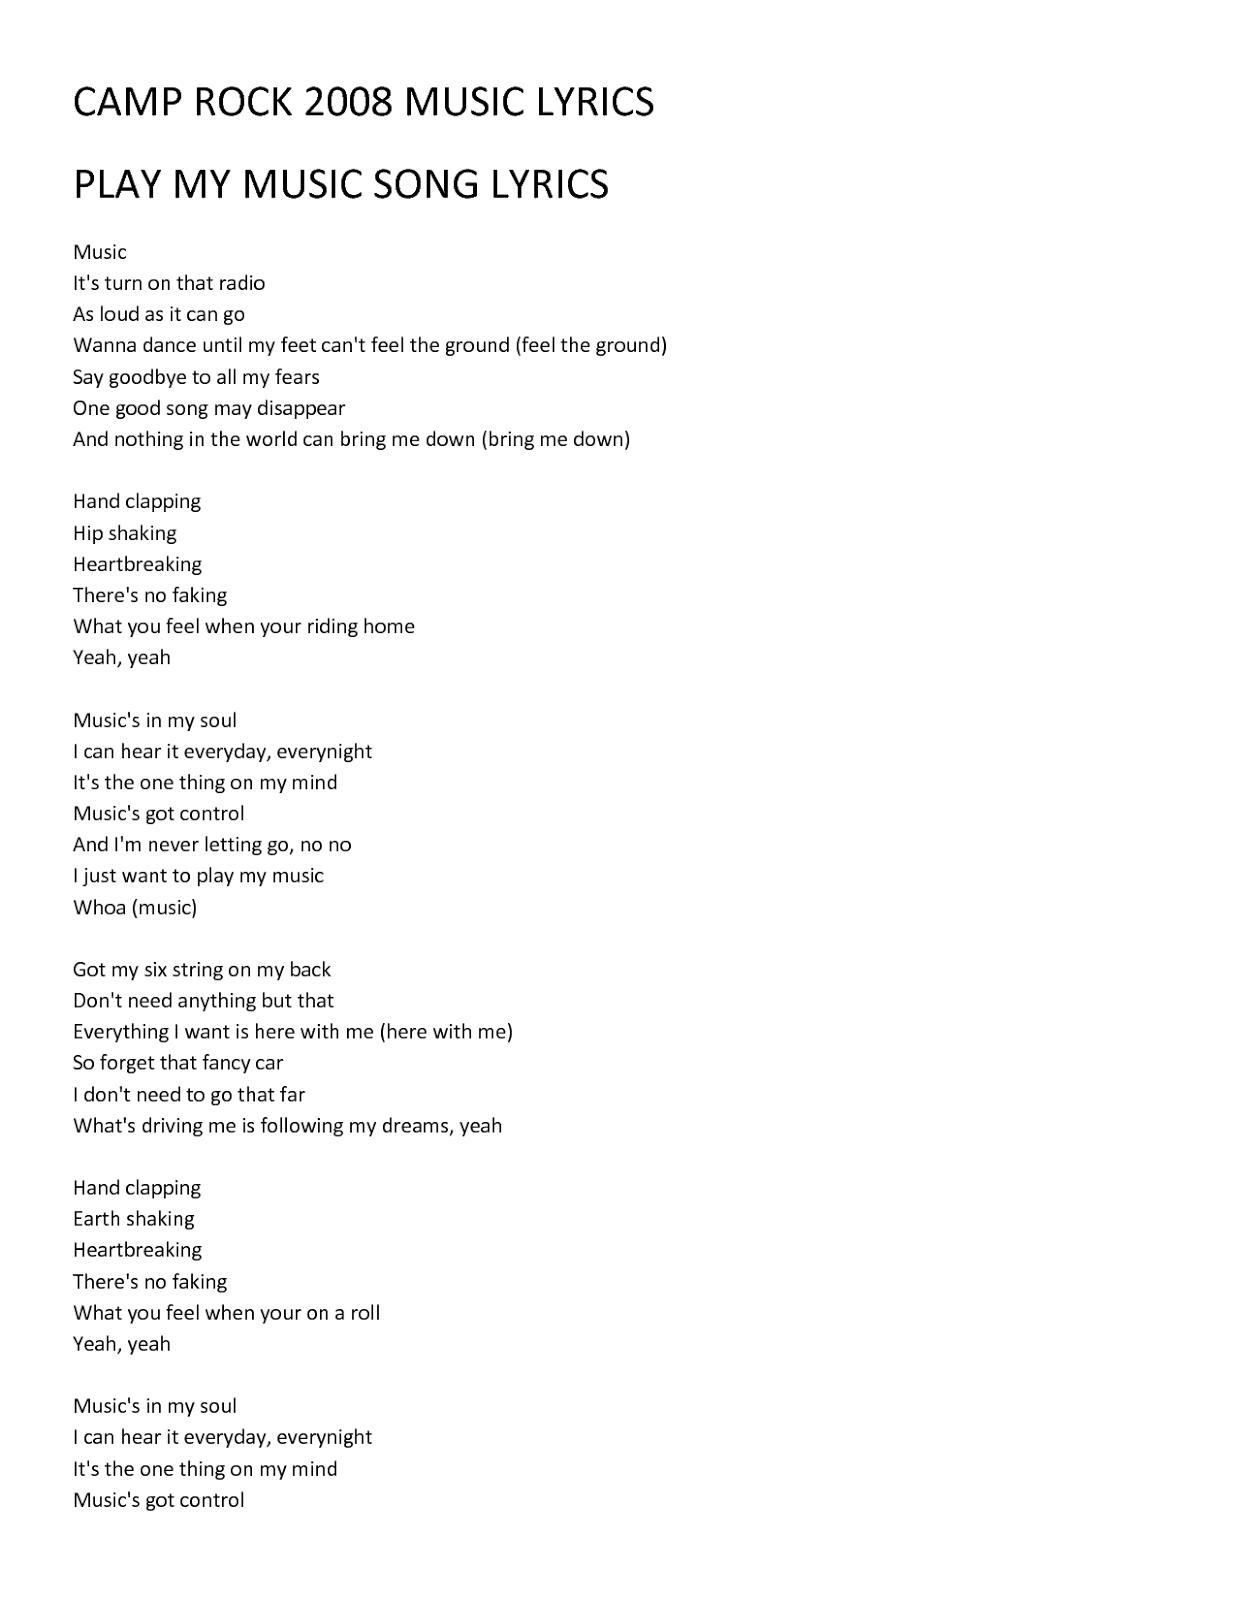 lyrics song: Camp Rock Music Lyrics Play Song